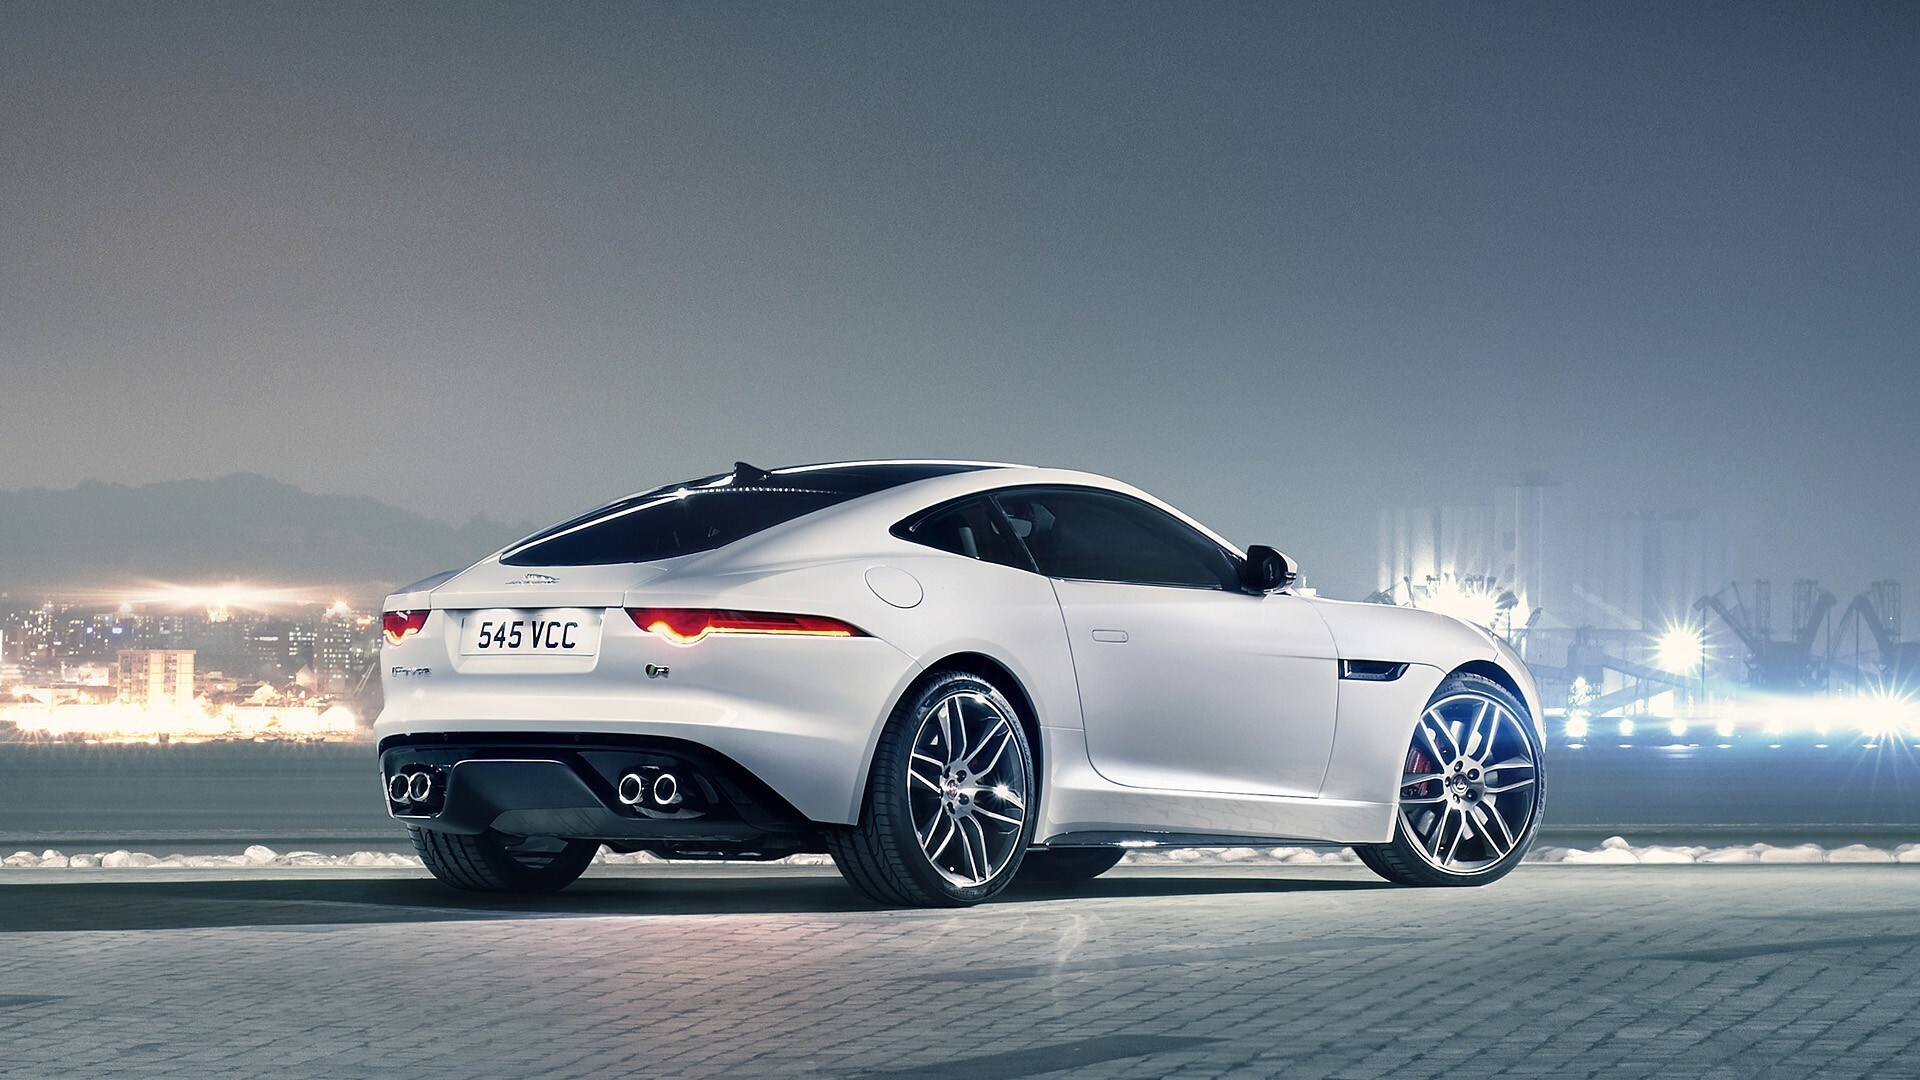 White Jaguar F Type Car Wallpaper Hd Wallpapers